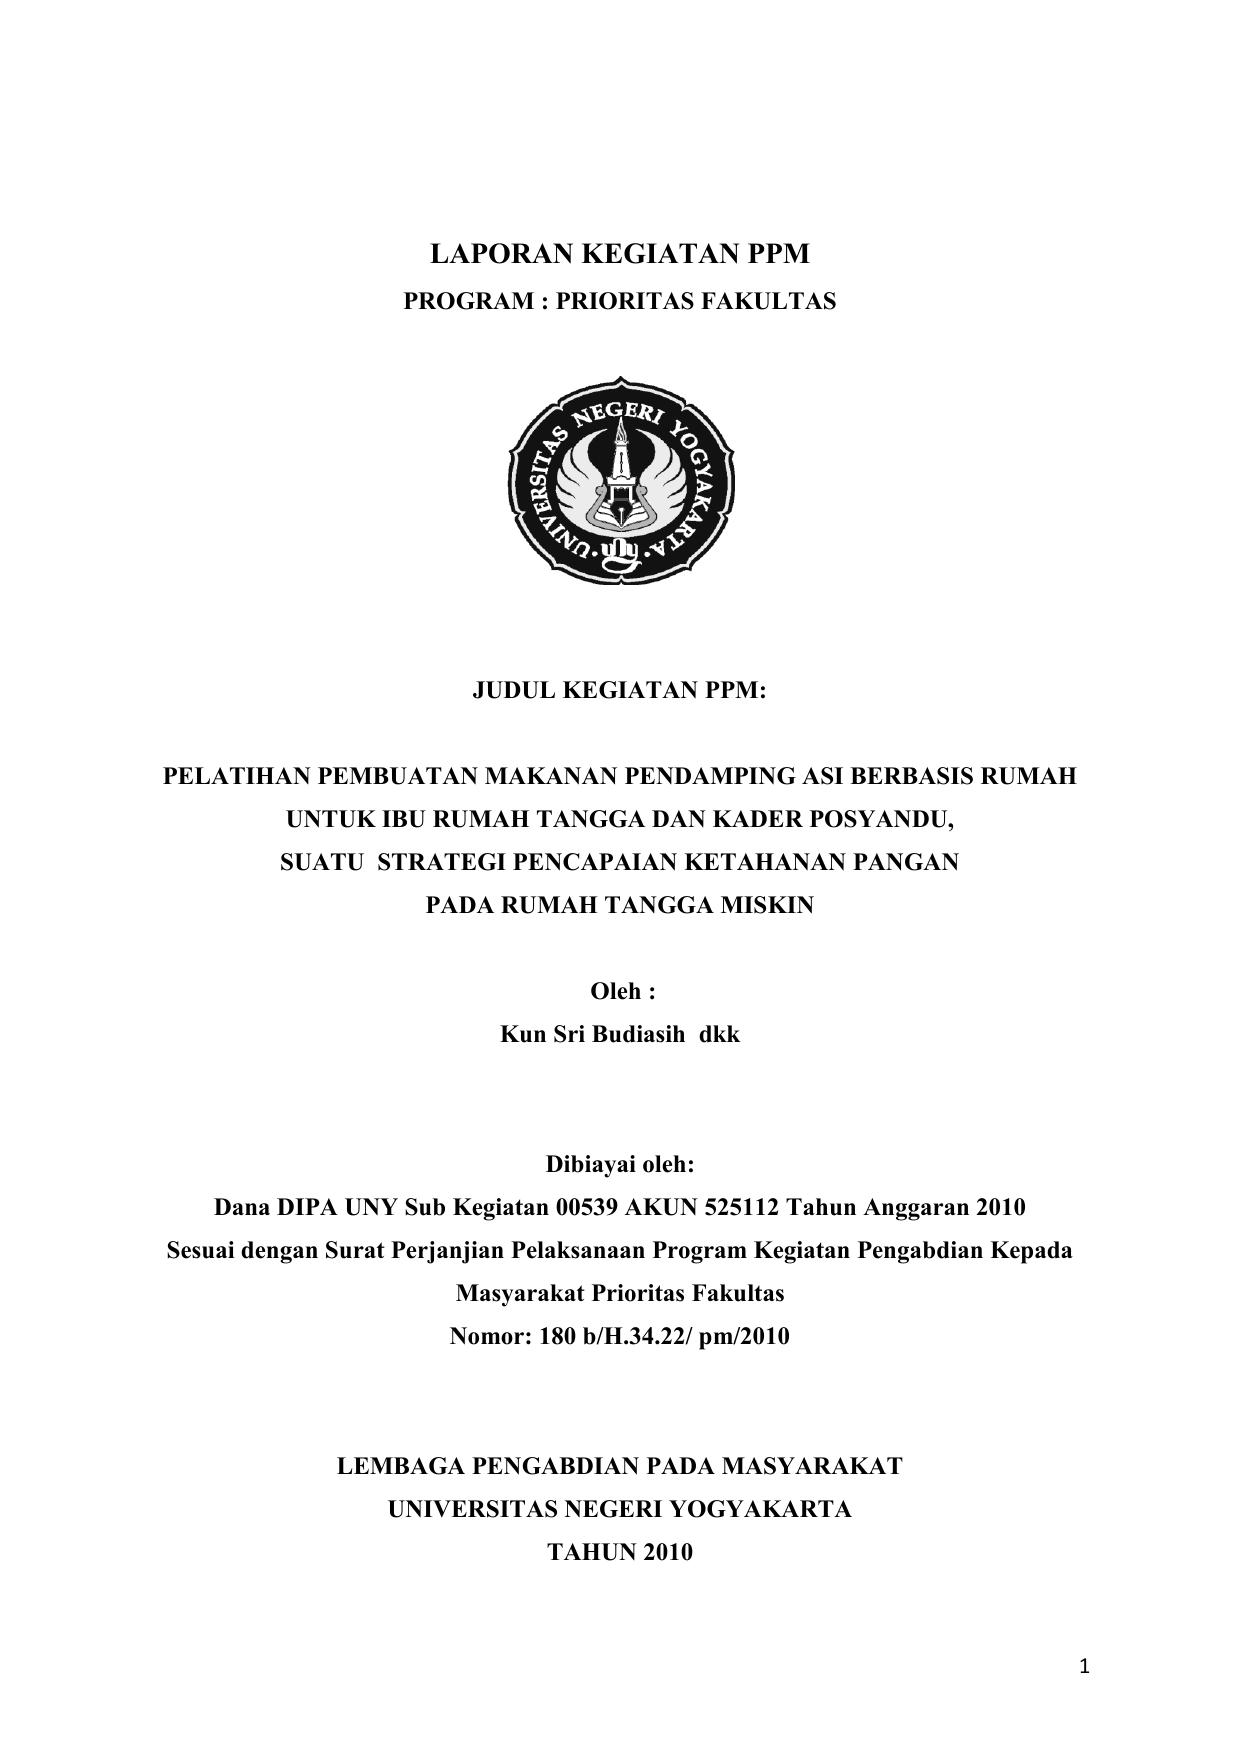 Laporan Kegiatan Ppm Staff Site Universitas Negeri Yogyakarta